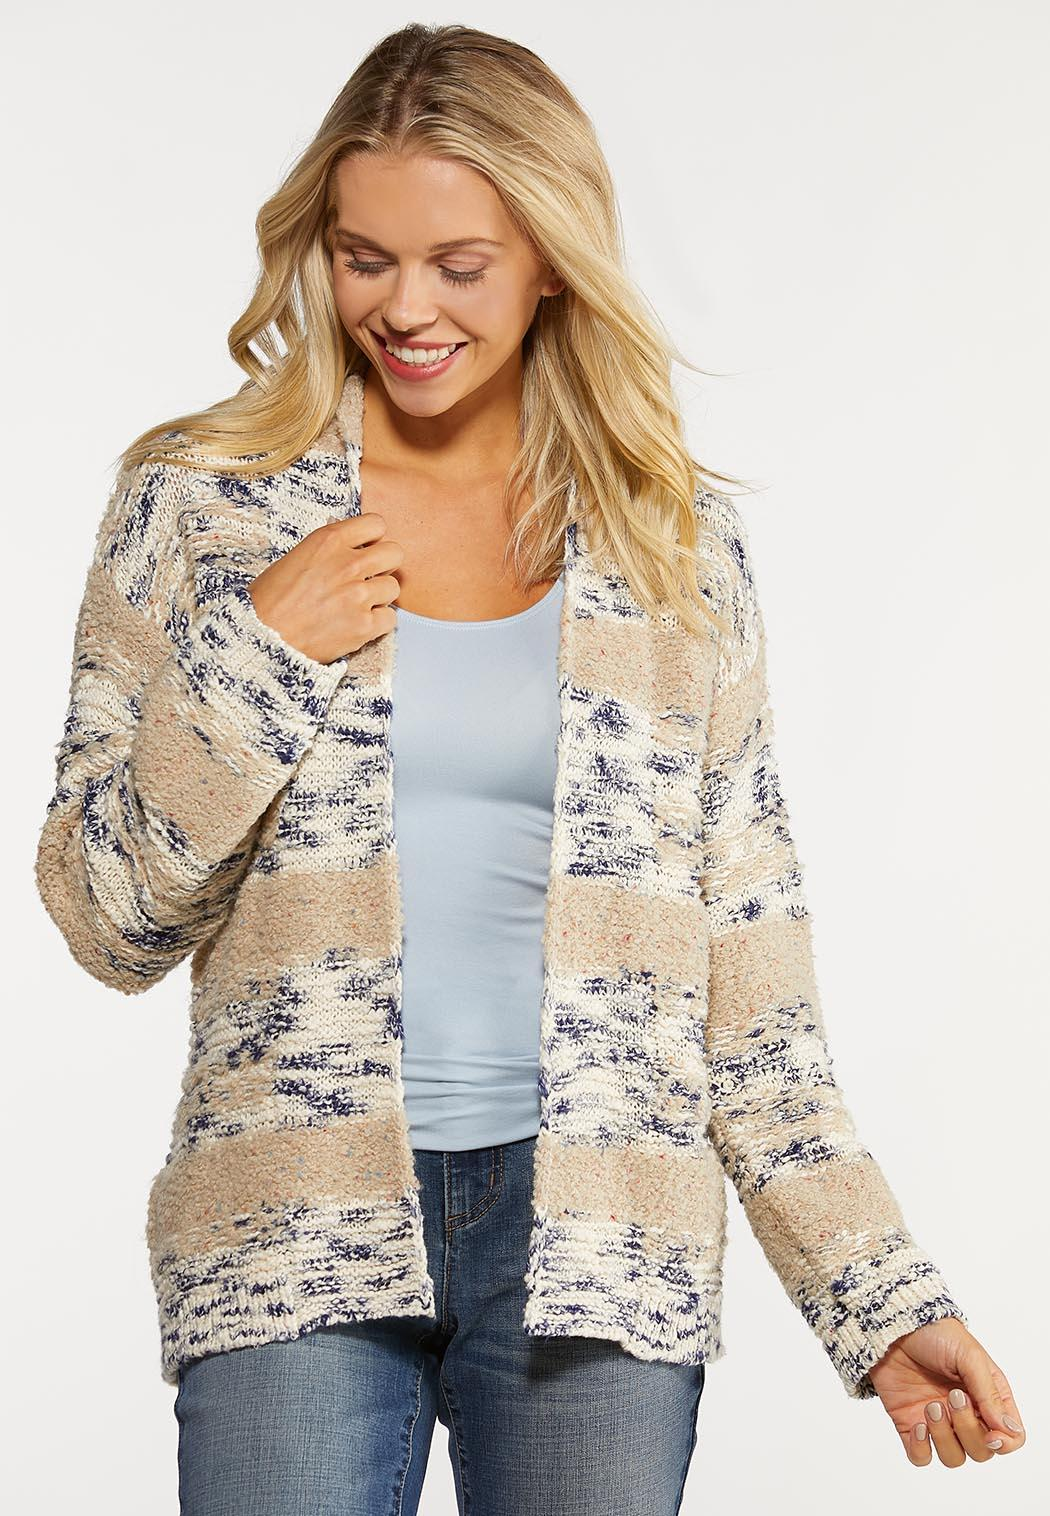 Plus Size Neutral Navy Cardigan Sweater